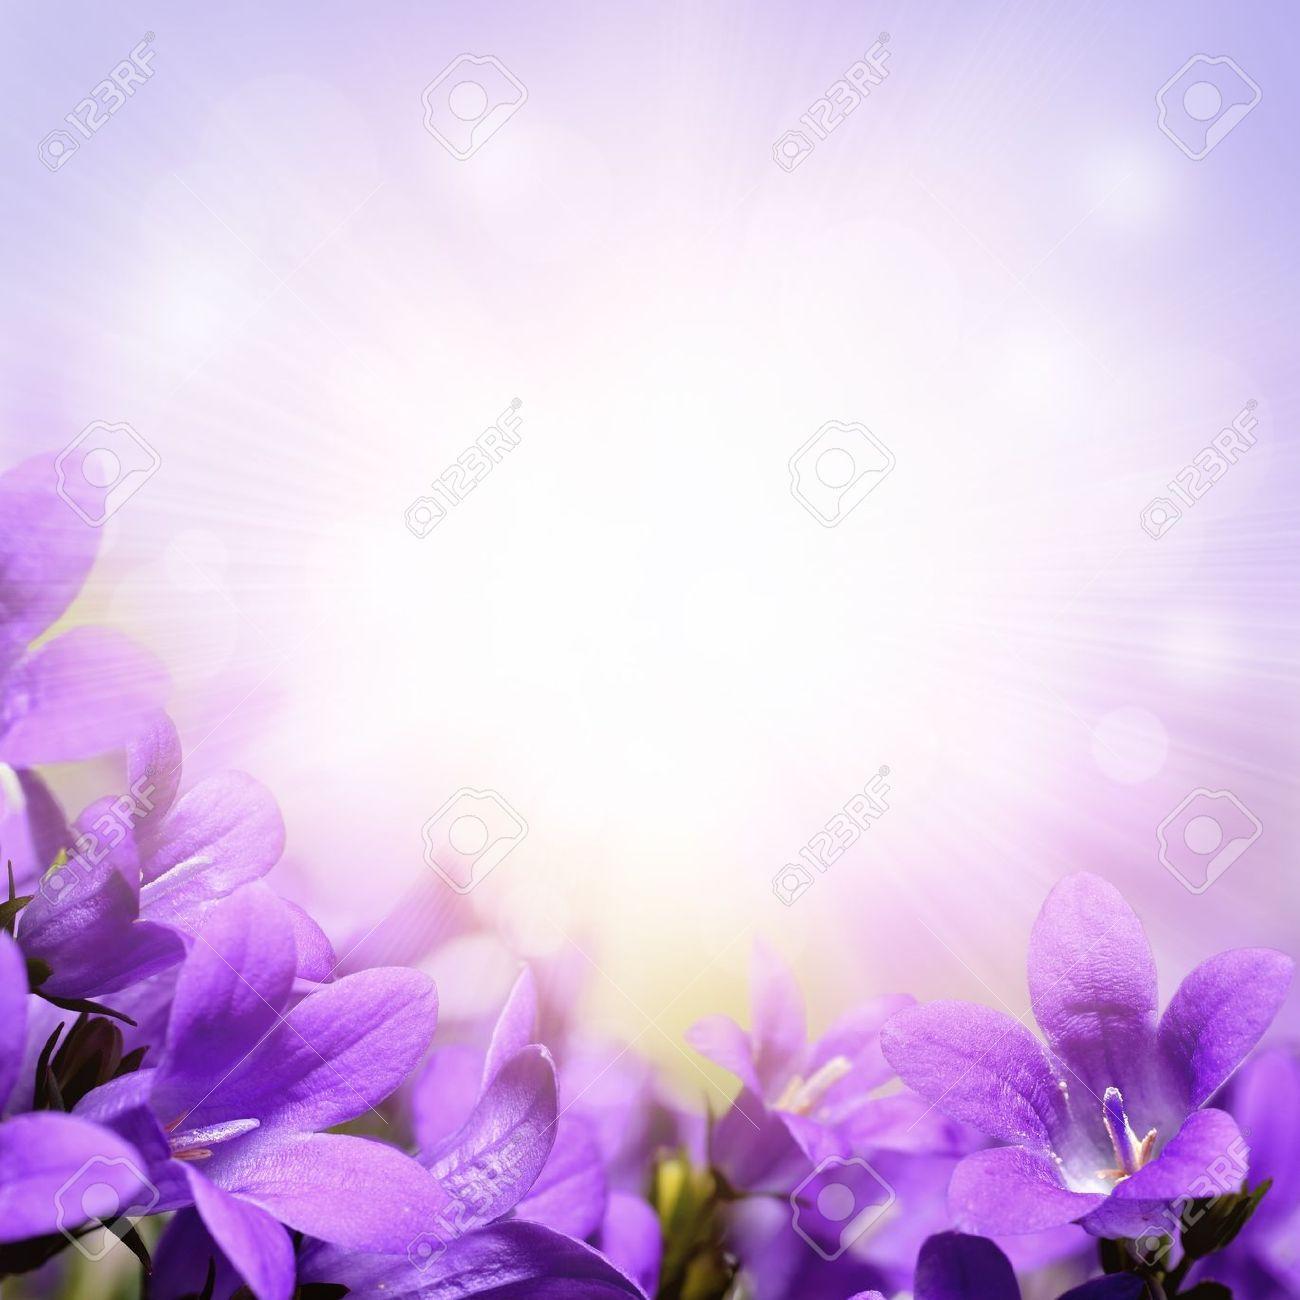 lavender background wedding Wedding Invitation Border lavender